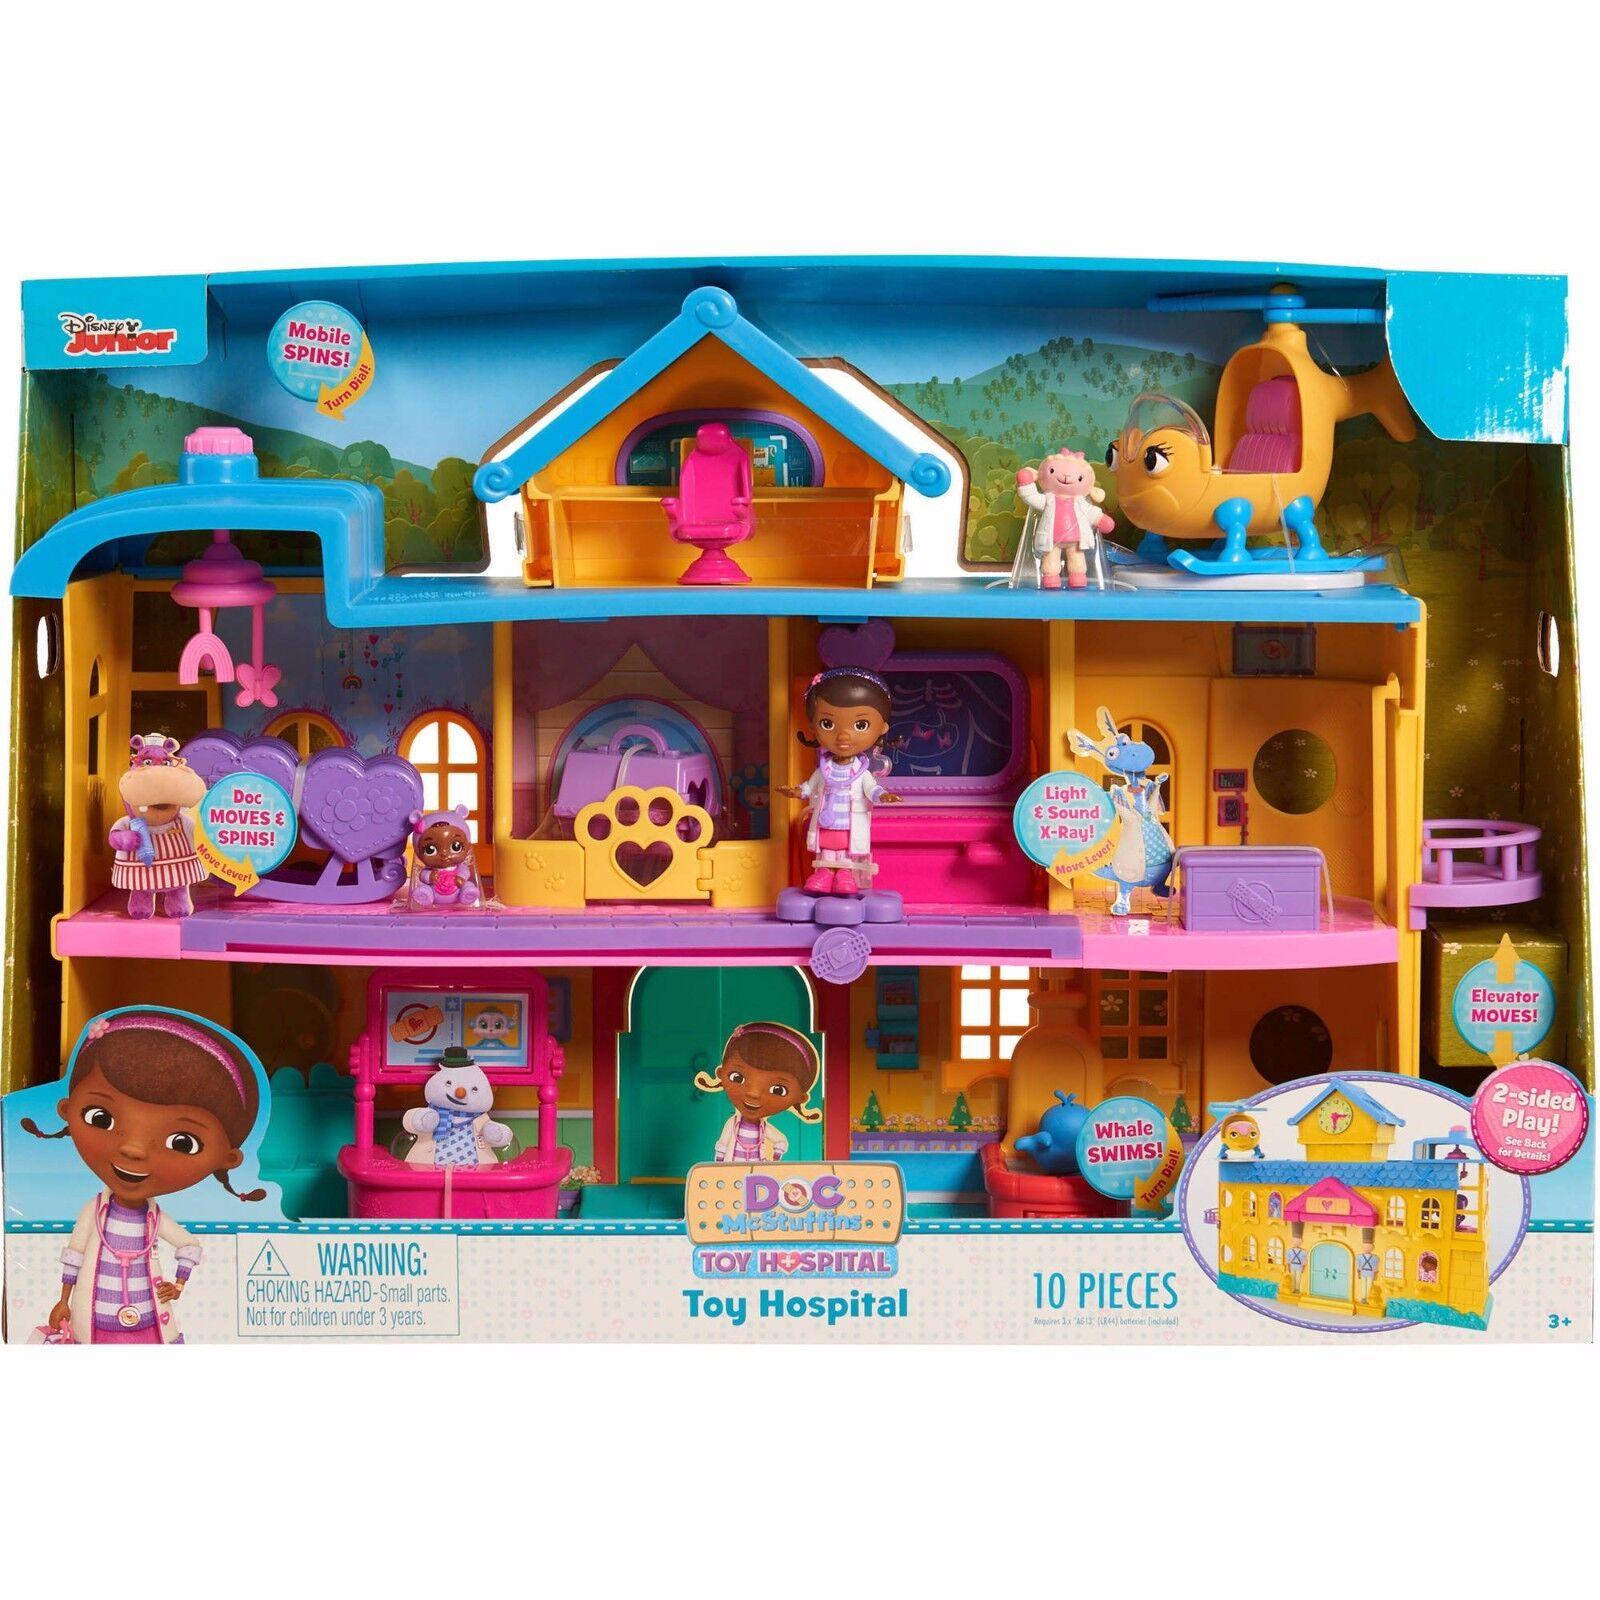 Kupit Disney Doc Mcstuffins Toy Hospital Playset Doll House Na Ebay